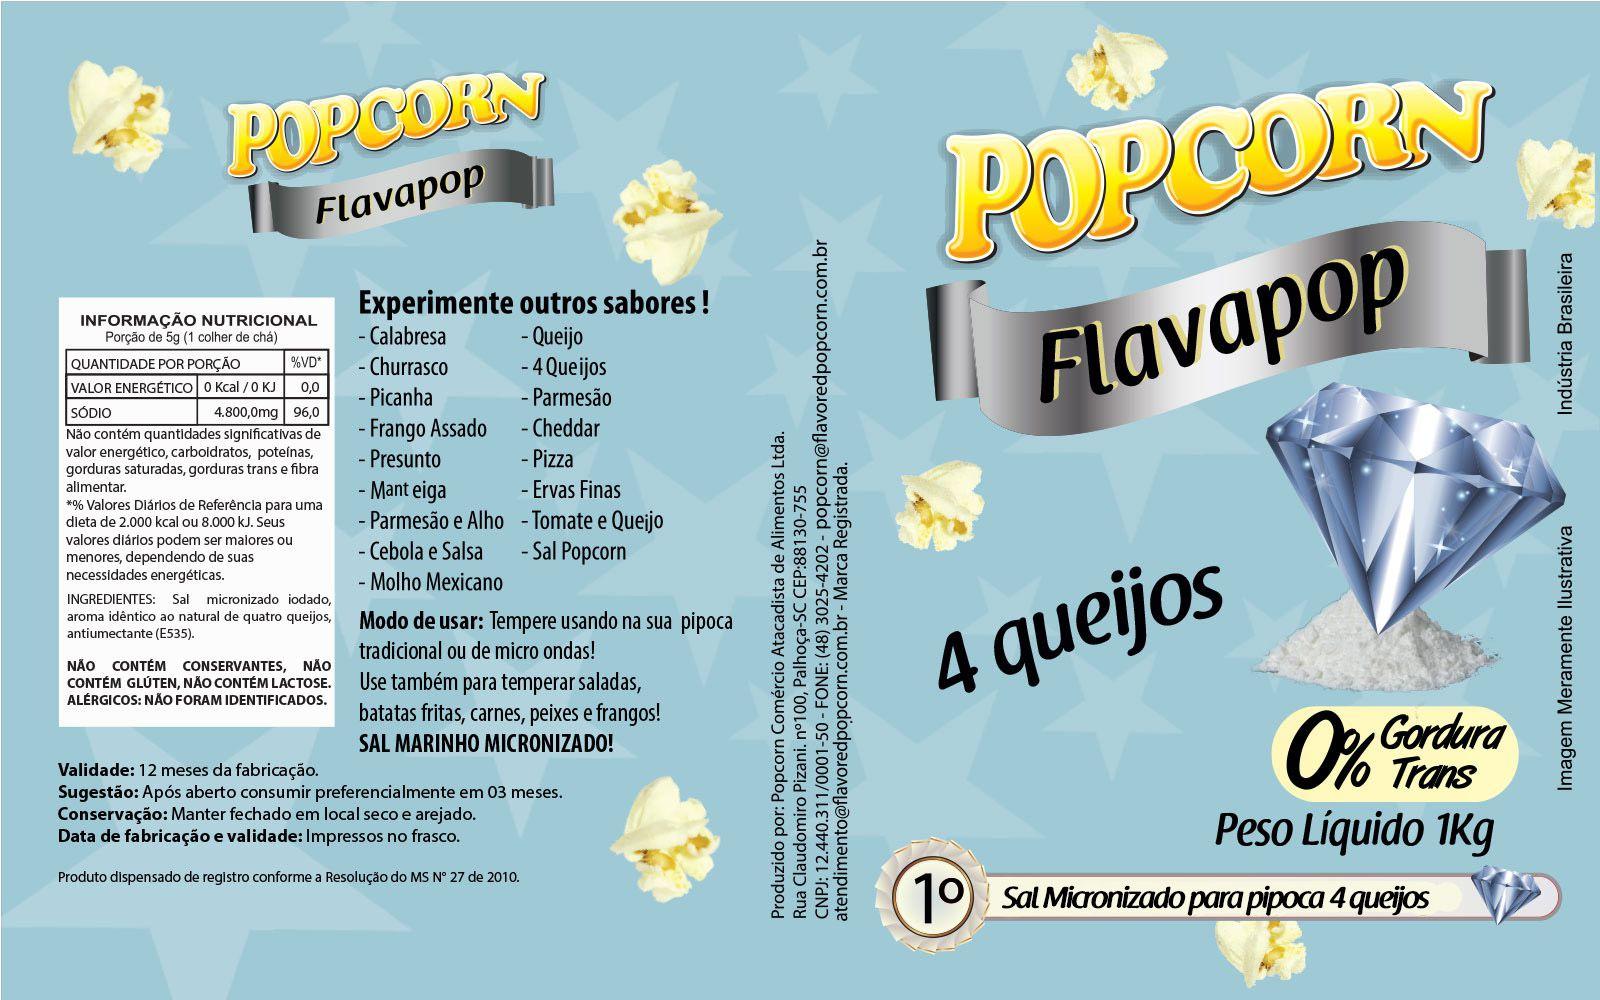 FLAVAPOP - Original de cinema -  4 queijos - Micronizado Popcorn  - Pct 1kg